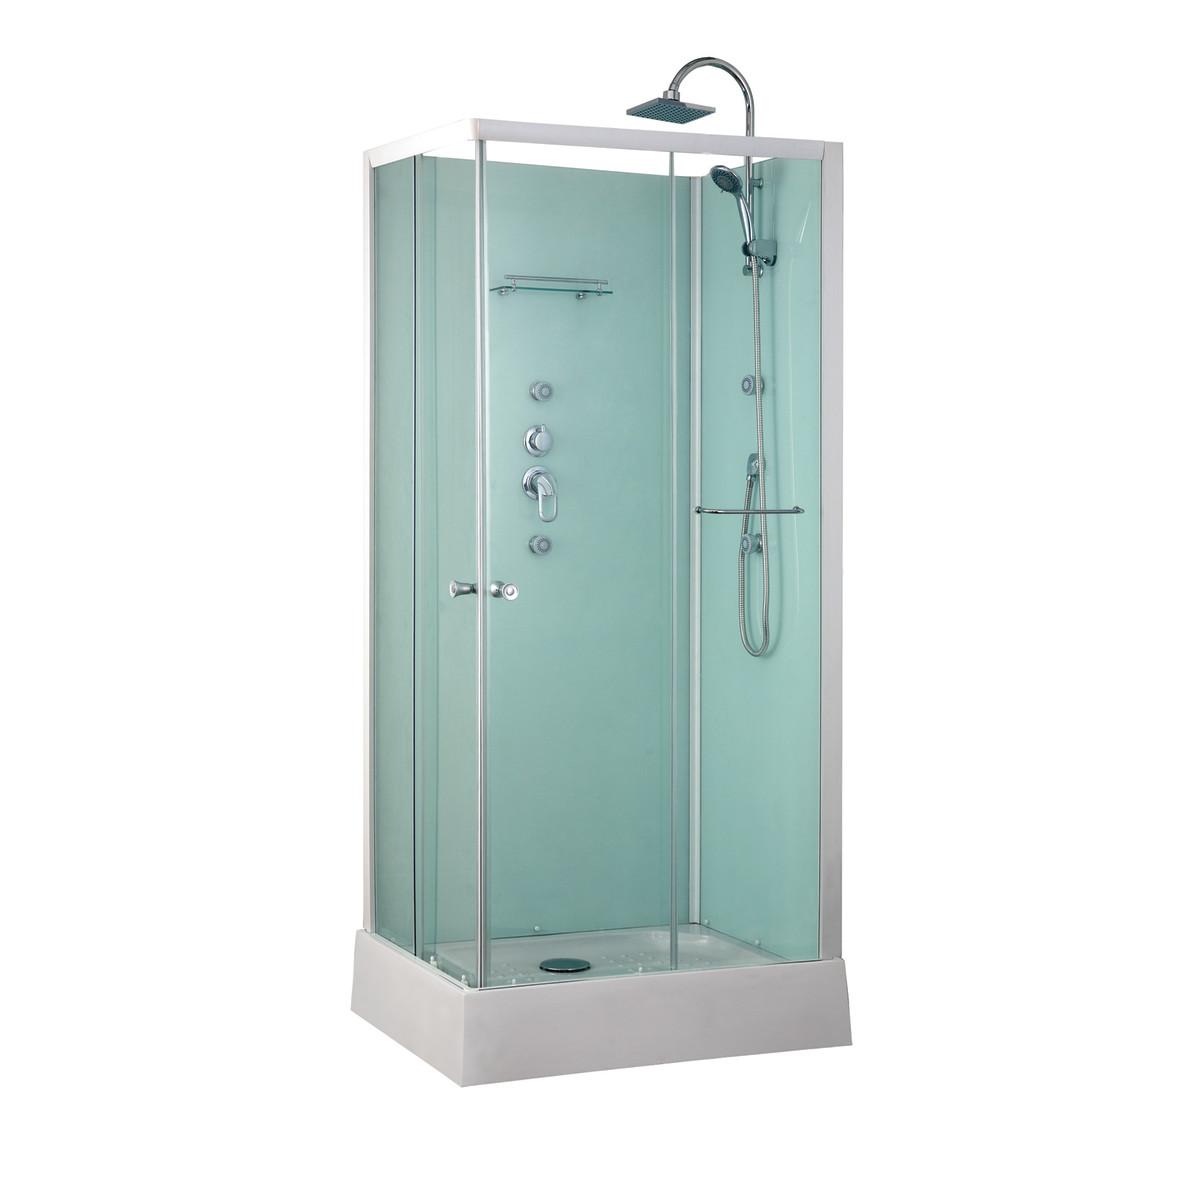 Cabina doccia completa 75 x 140 for Box doccia tre lati leroy merlin